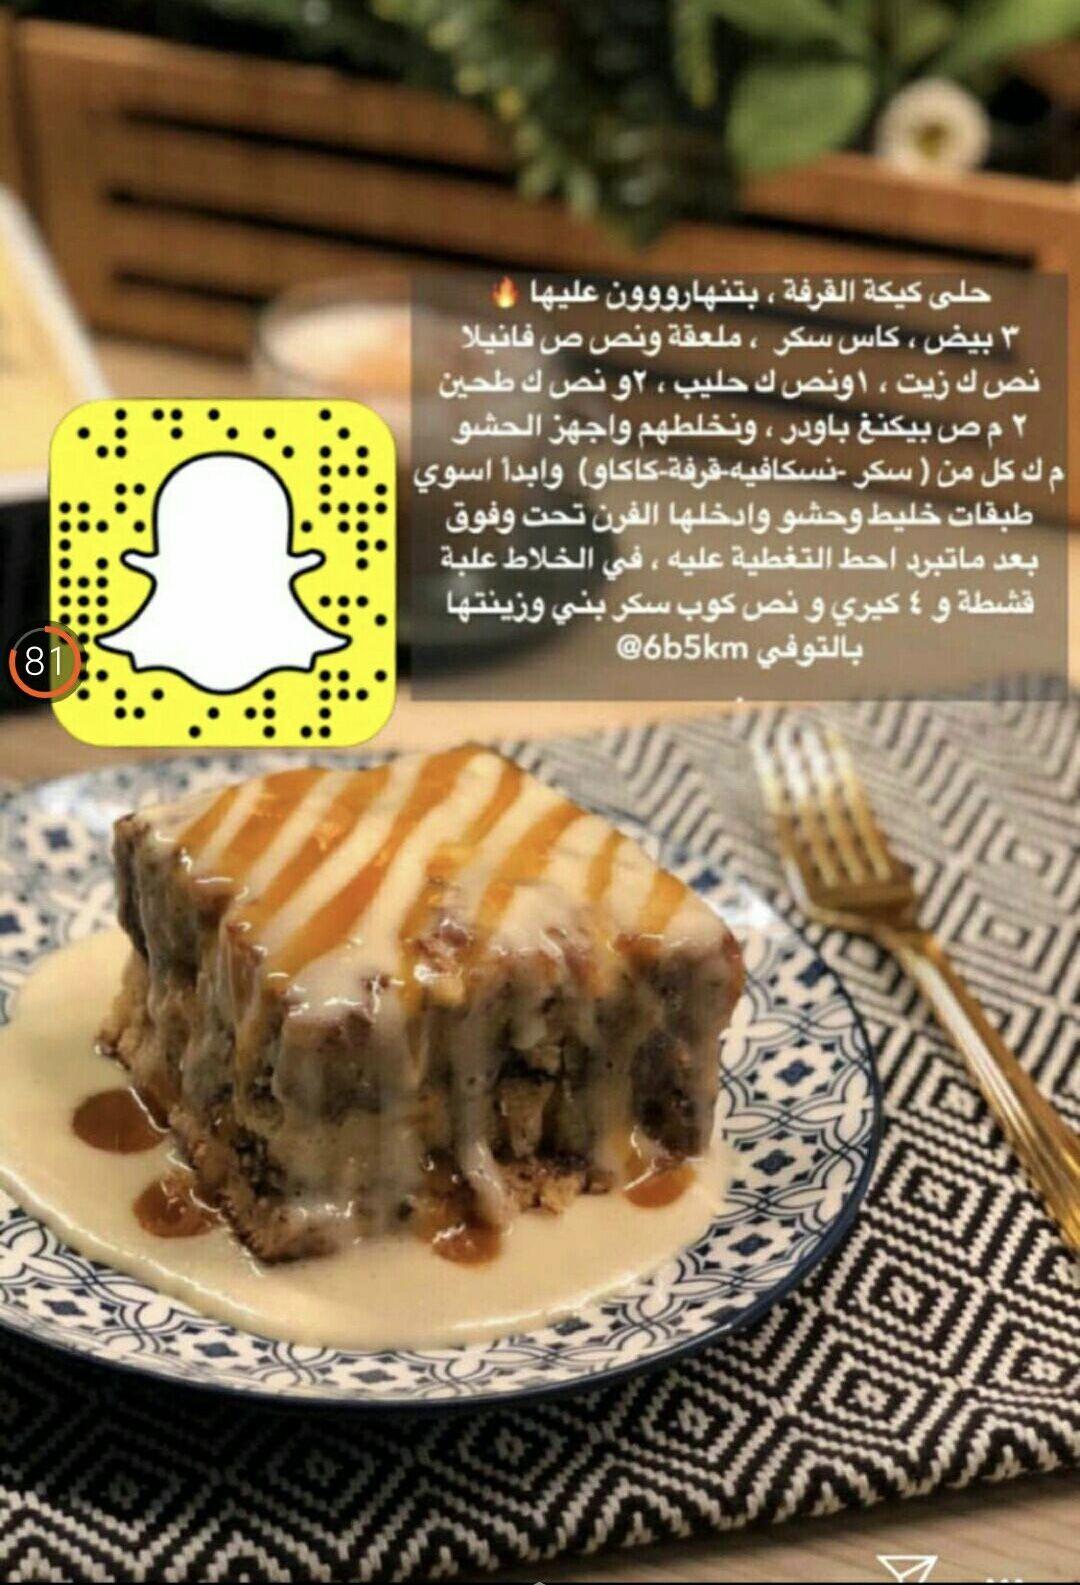 Pin By Hana On حلويات Food Drinks Dessert Yummy Food Dessert Dessert Recipes